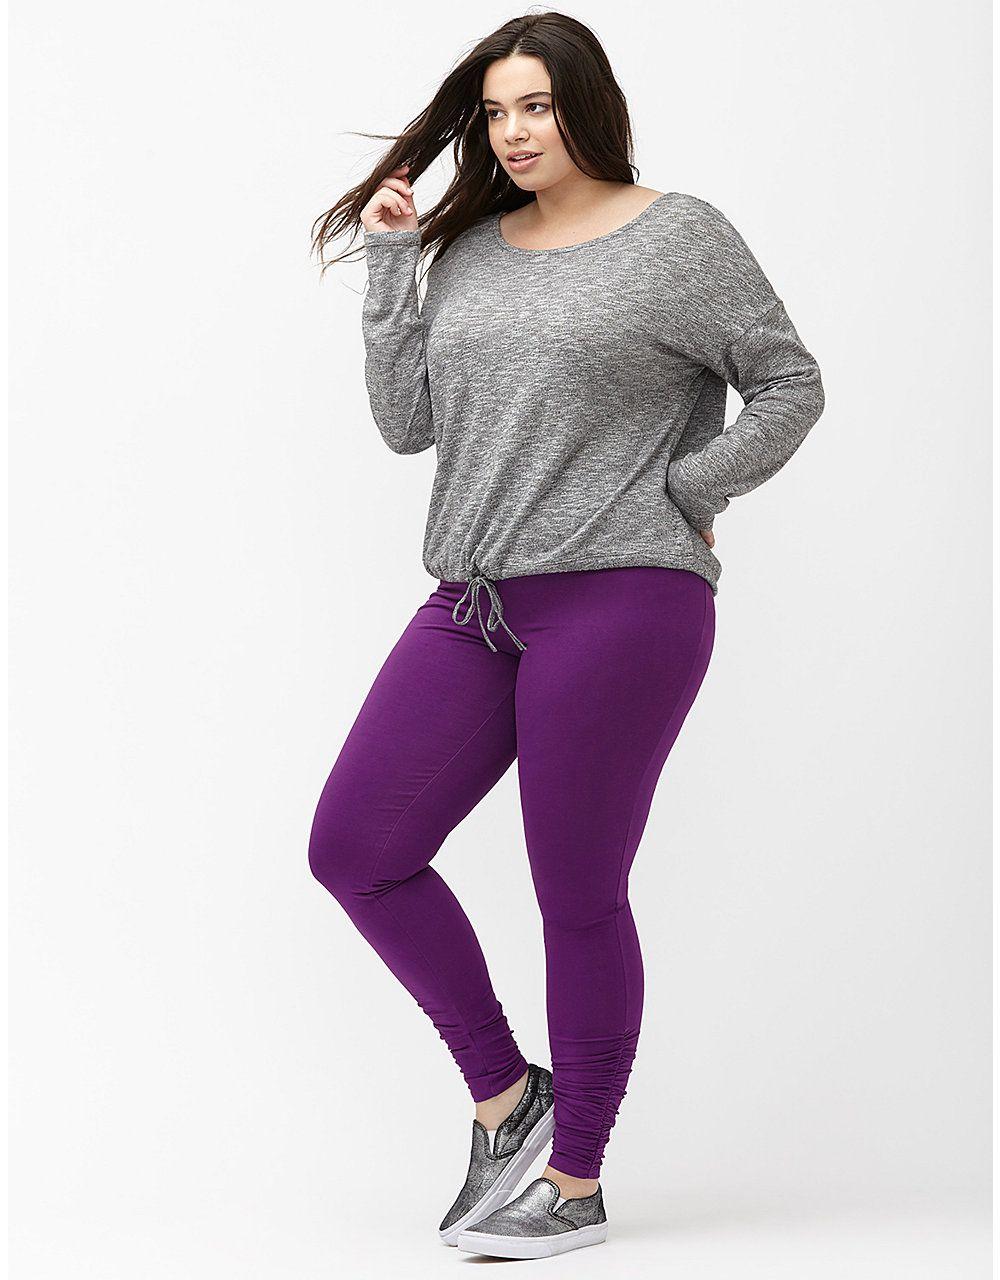 b8e7257528e Signature Stretch ruched active leggings by Livi Active